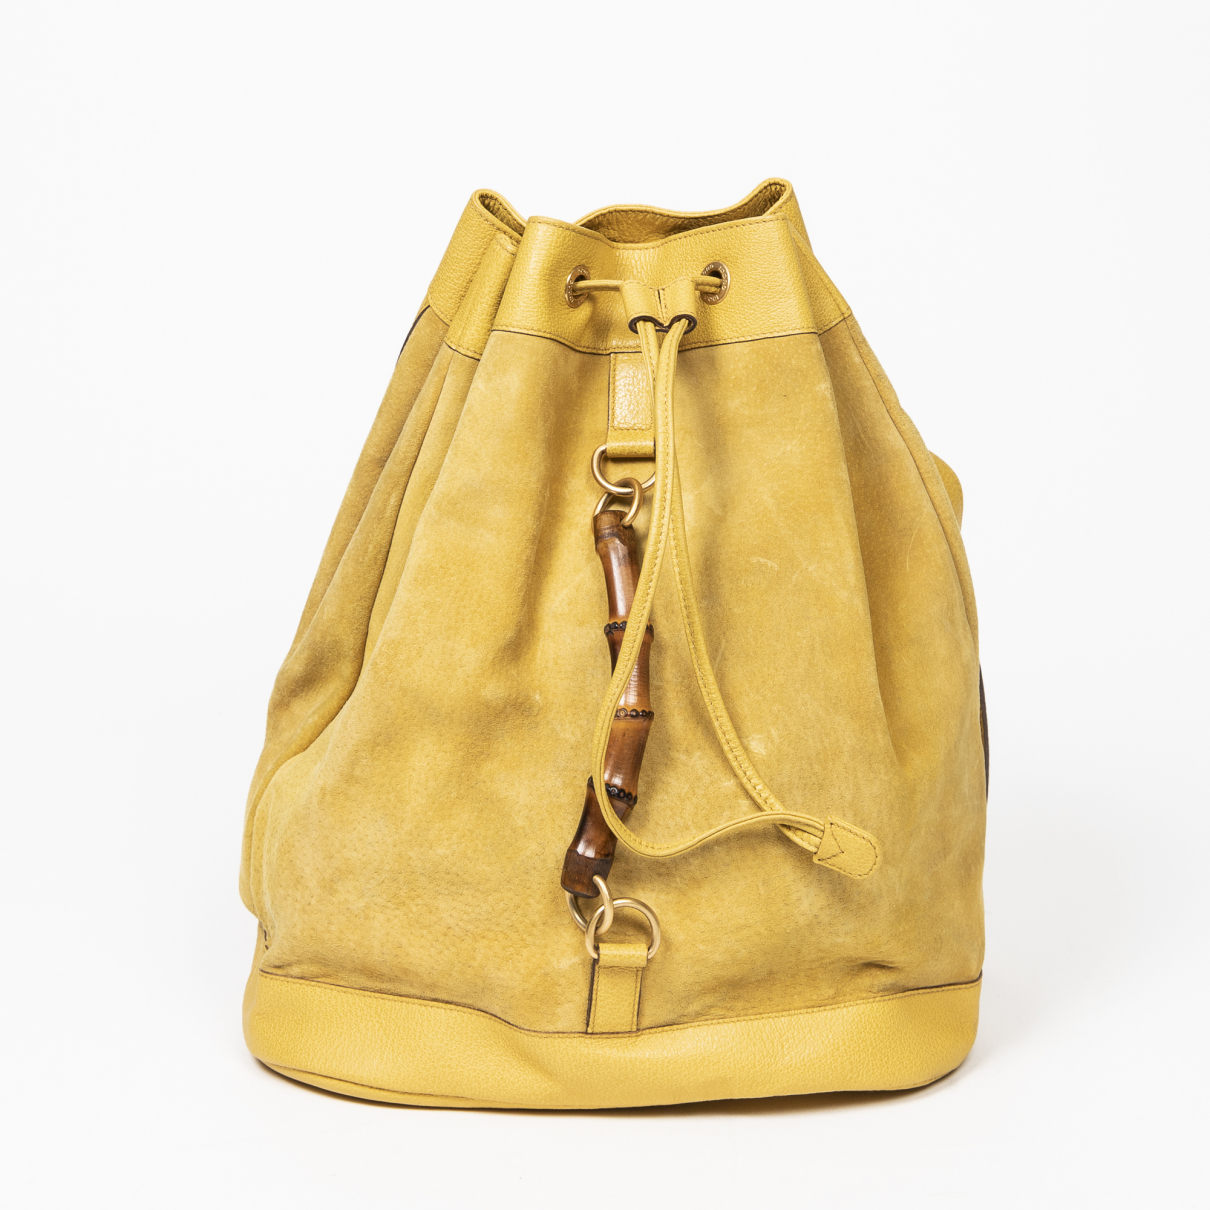 Gucci Bamboo Yellow Leather handbag for Women \N